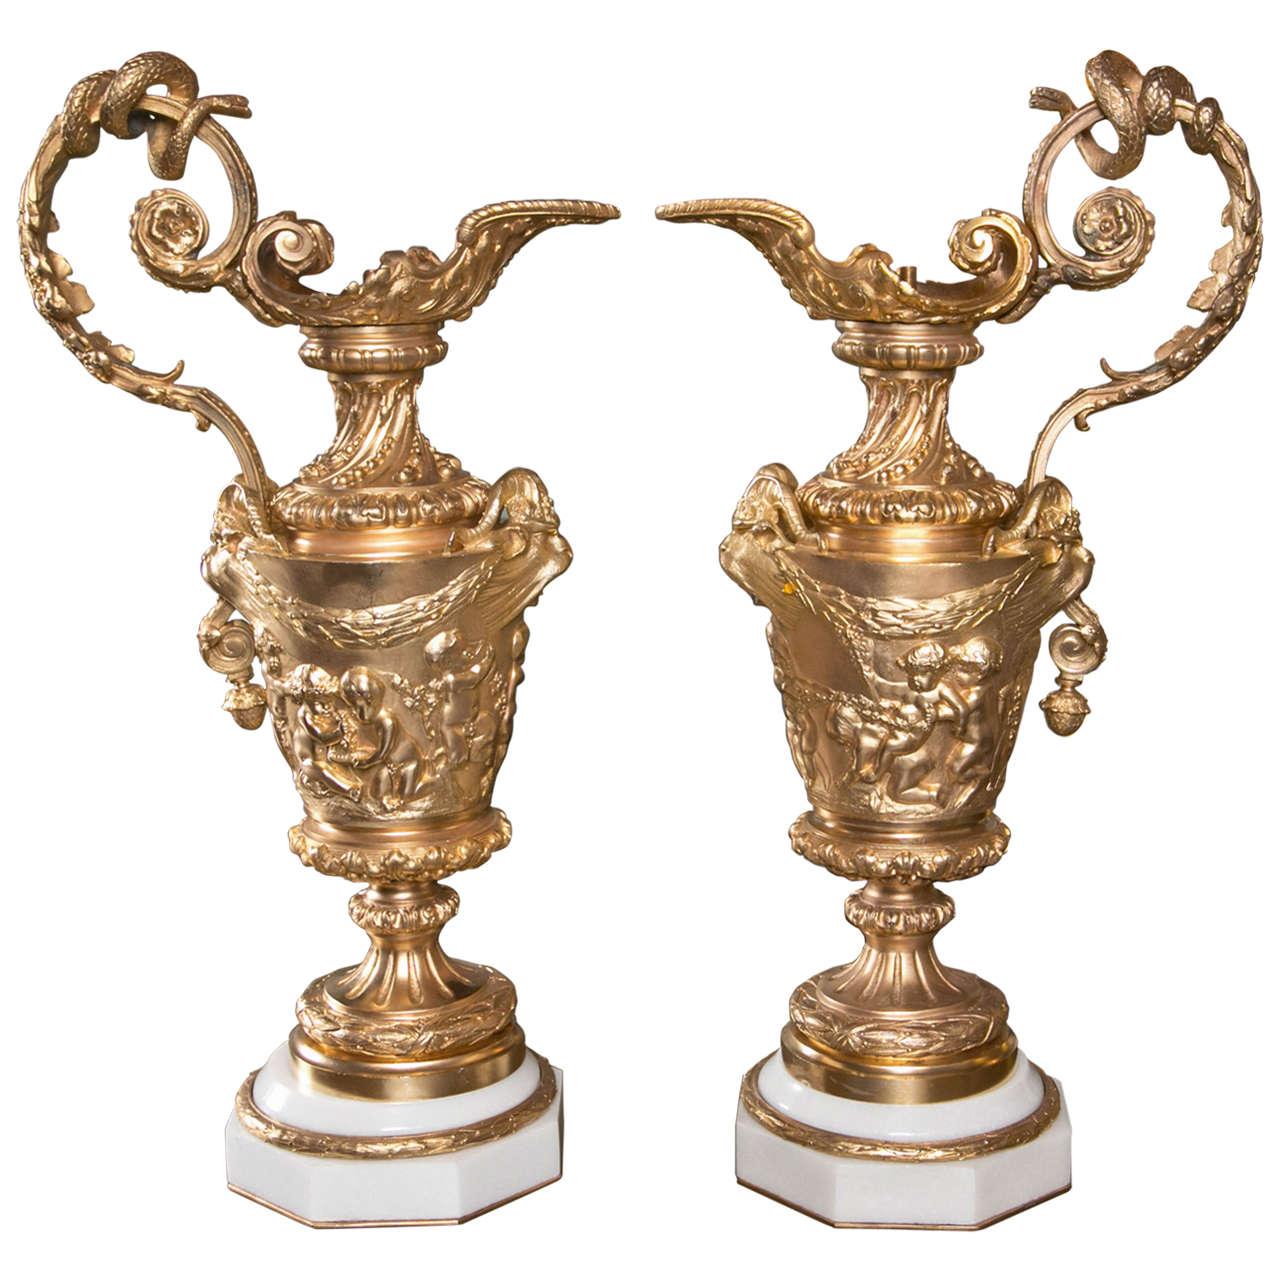 Pair of Gilded Metal Lamp Bases